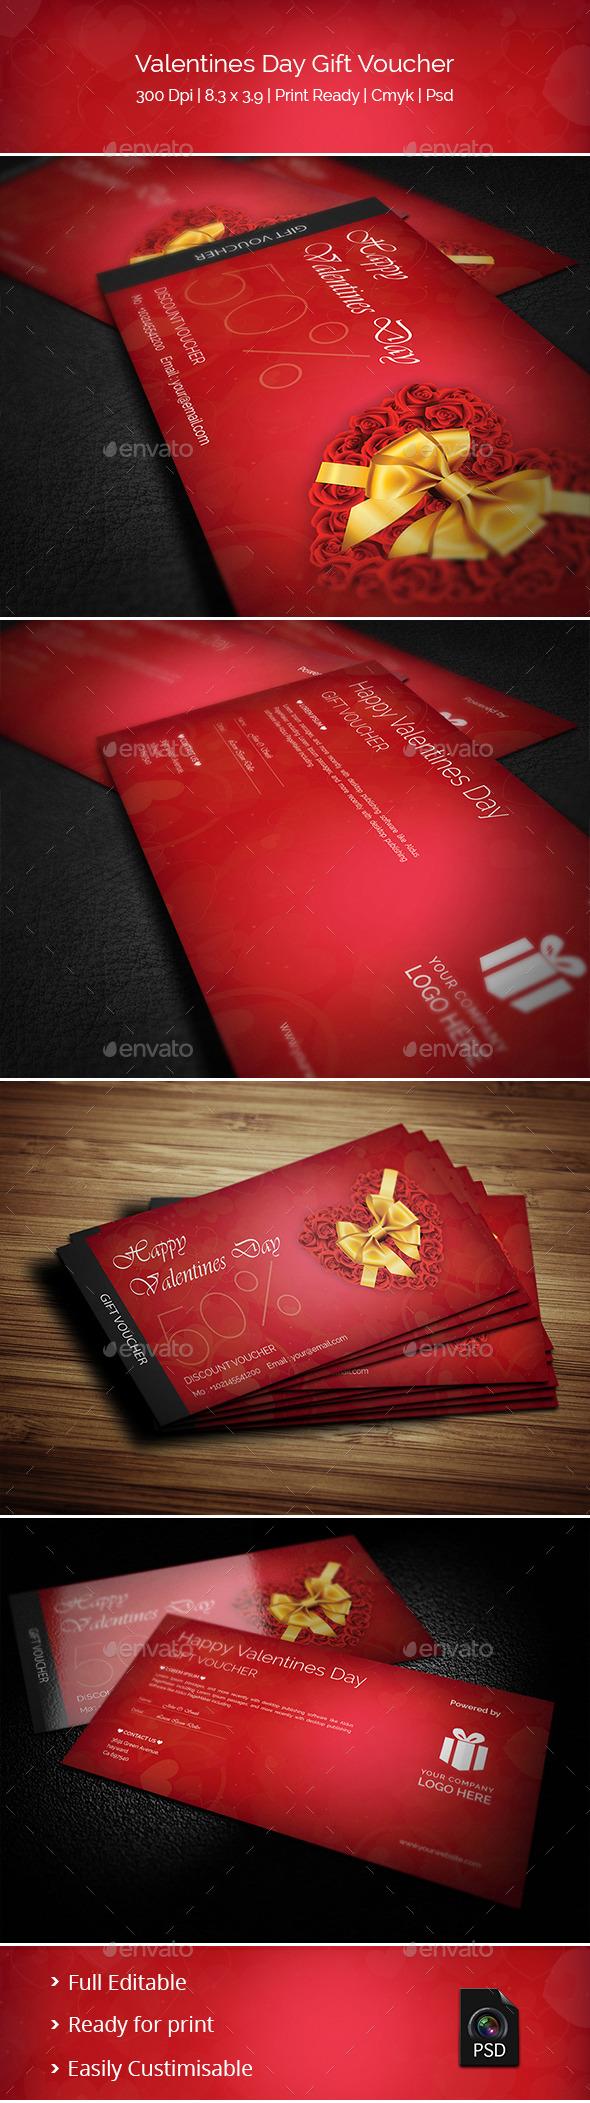 Creative Valentines Day Gift Voucher - Cards & Invites Print Templates